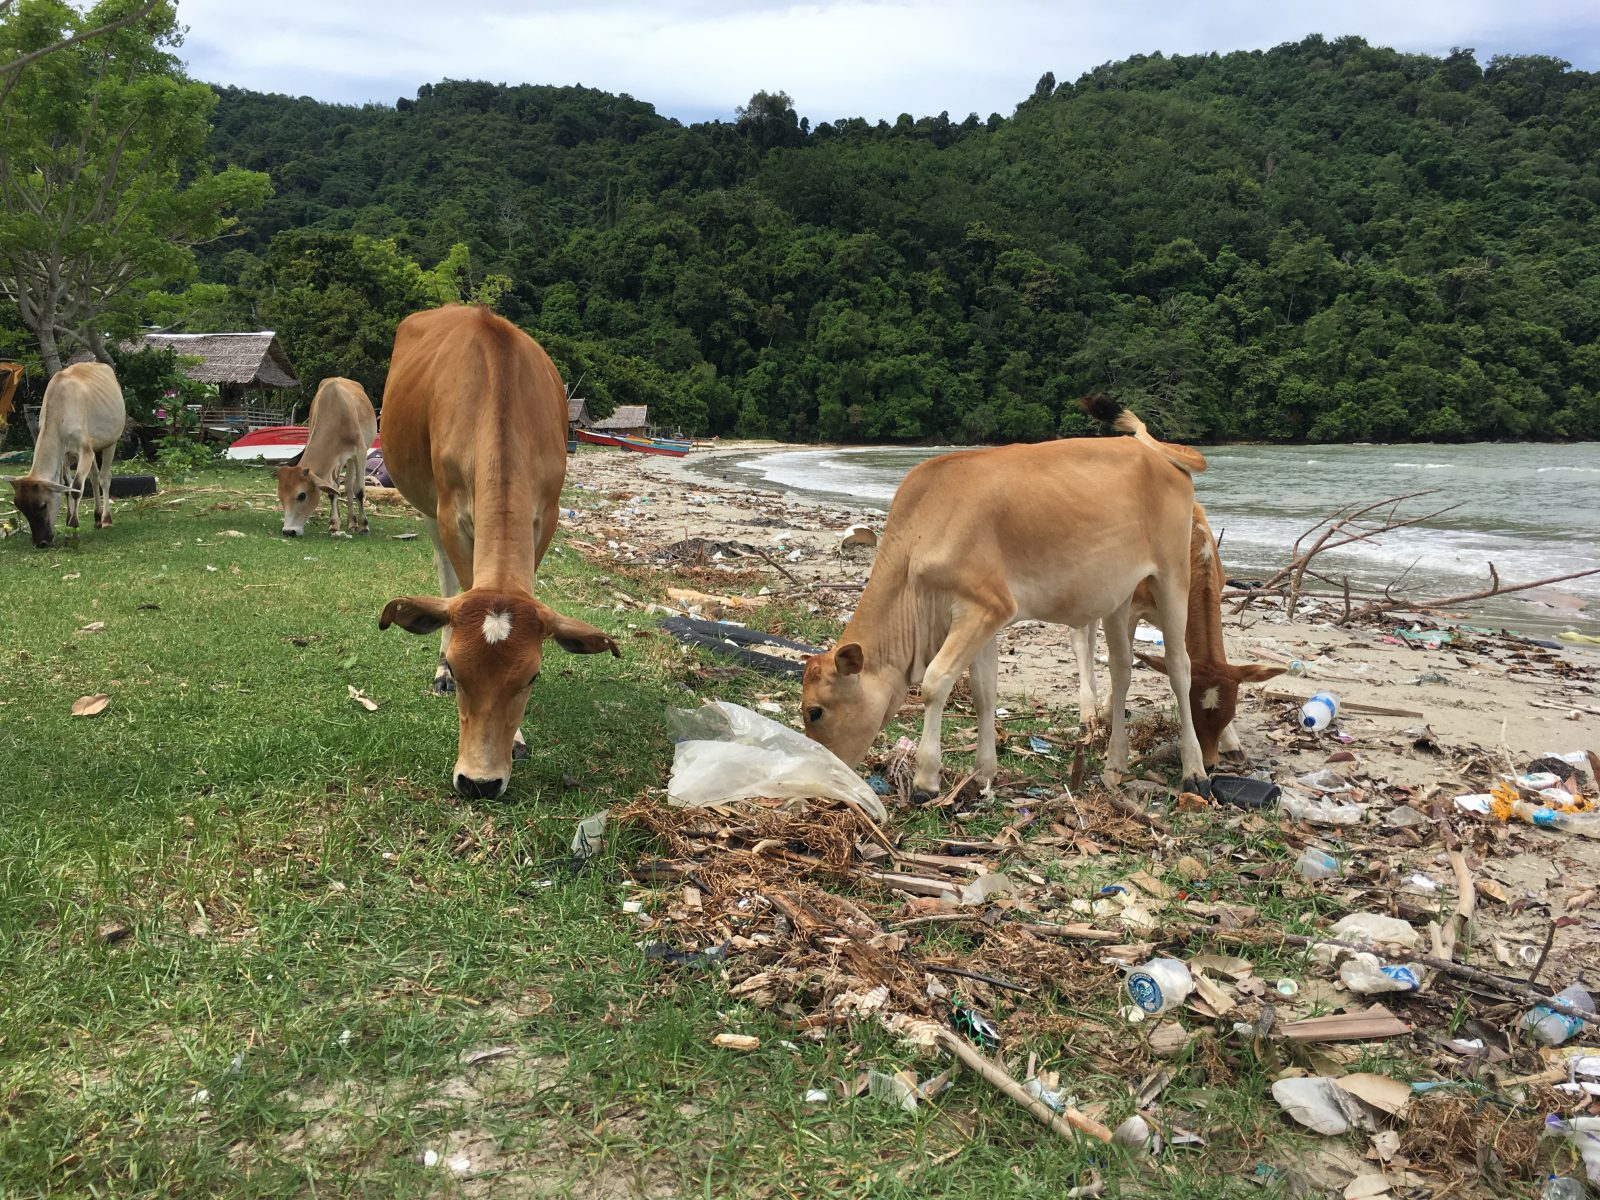 camps_international_ella_roch-perks_2018_the_effect_of_plastic